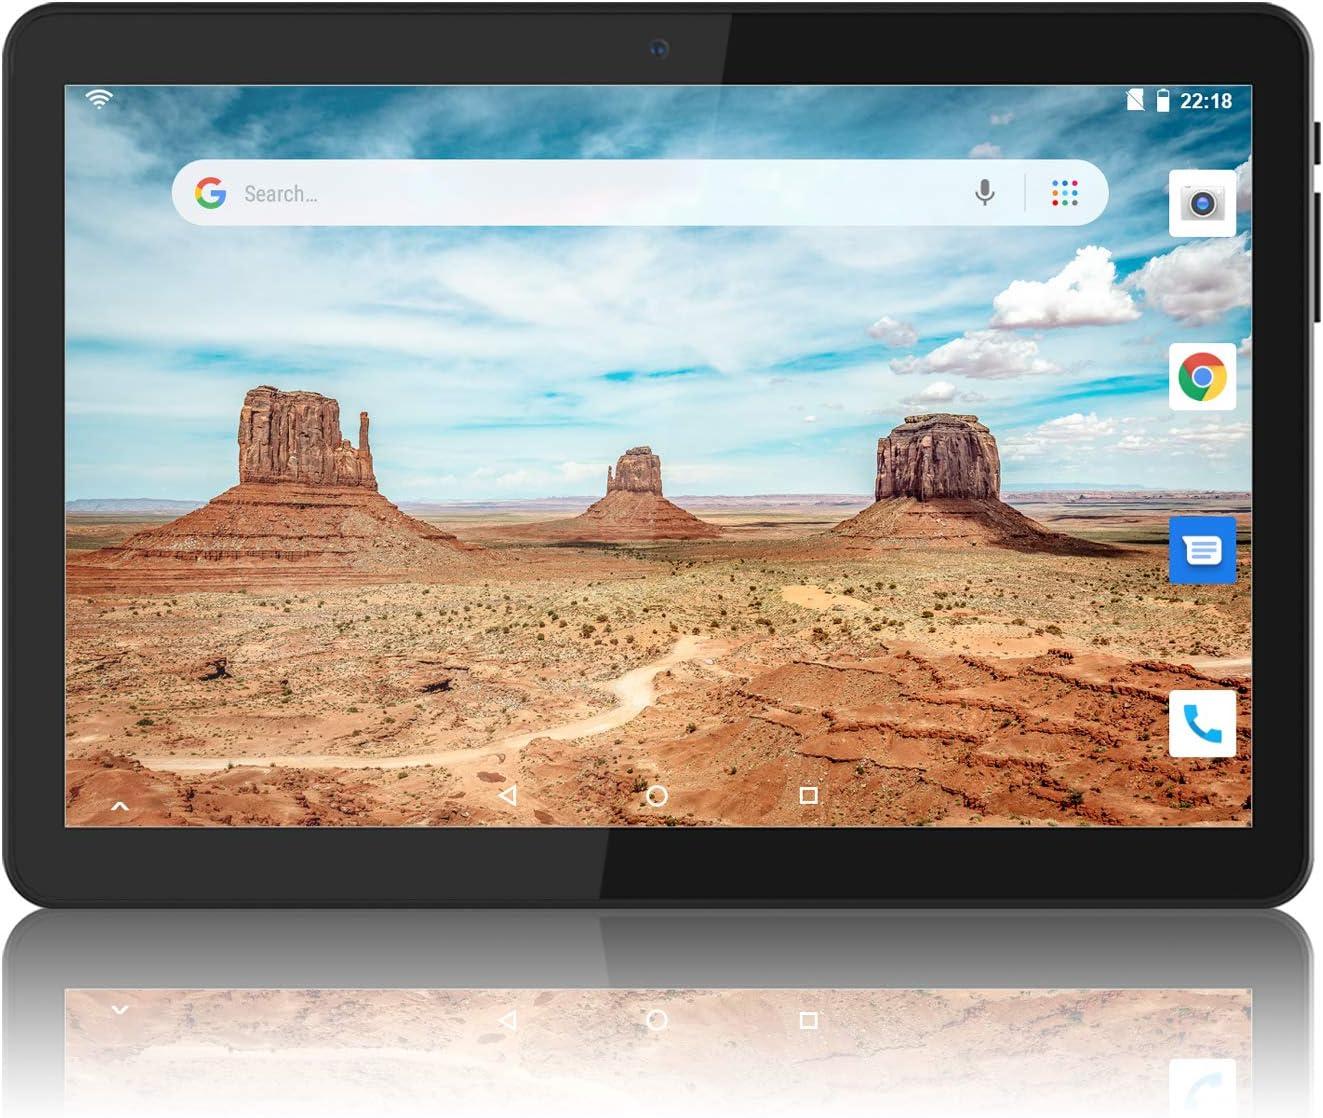 Tablet 10 Pulgadas Android 6.0 WiFi Unlocked 3G Phone Tablet PC 1GB + 16GB MTK6580 1.3GHz Quad-Core IPS Pantalla 800 × 1280 Dual Camera Soporte para teléfono Celular 2G 3G WiFi Bluetooth